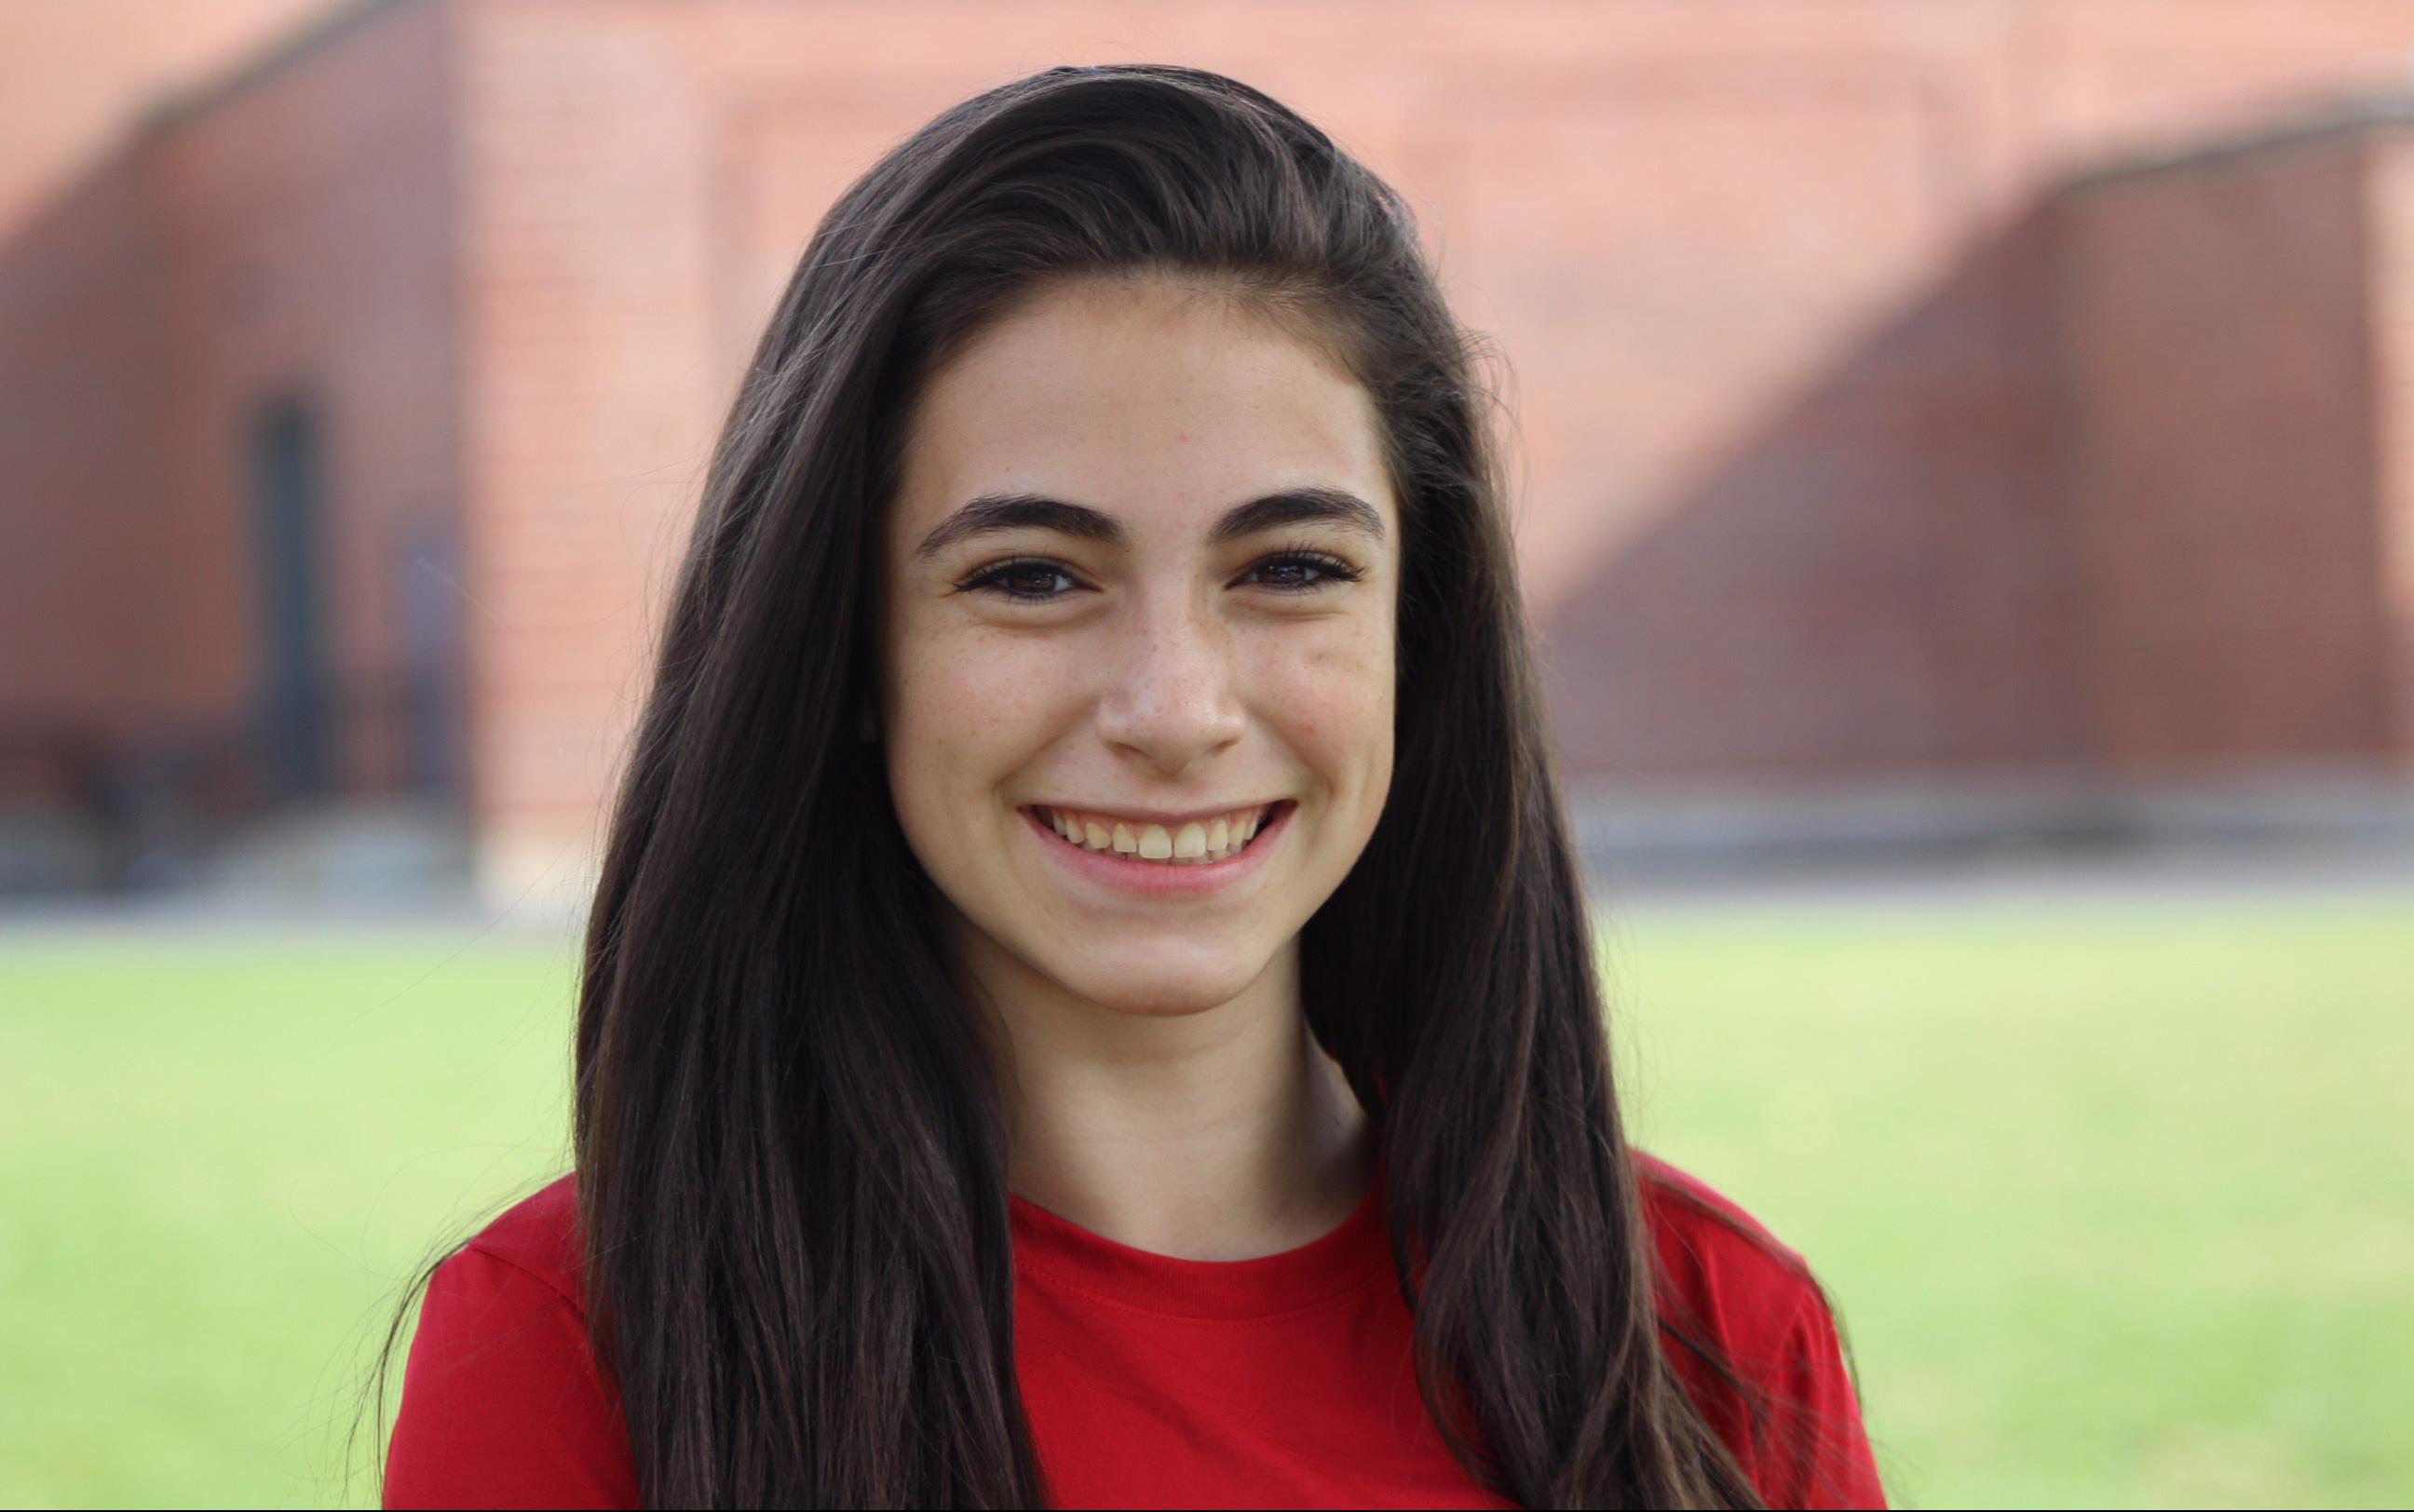 Emma Borrelli, quality fastpitch softball player and all around nice person